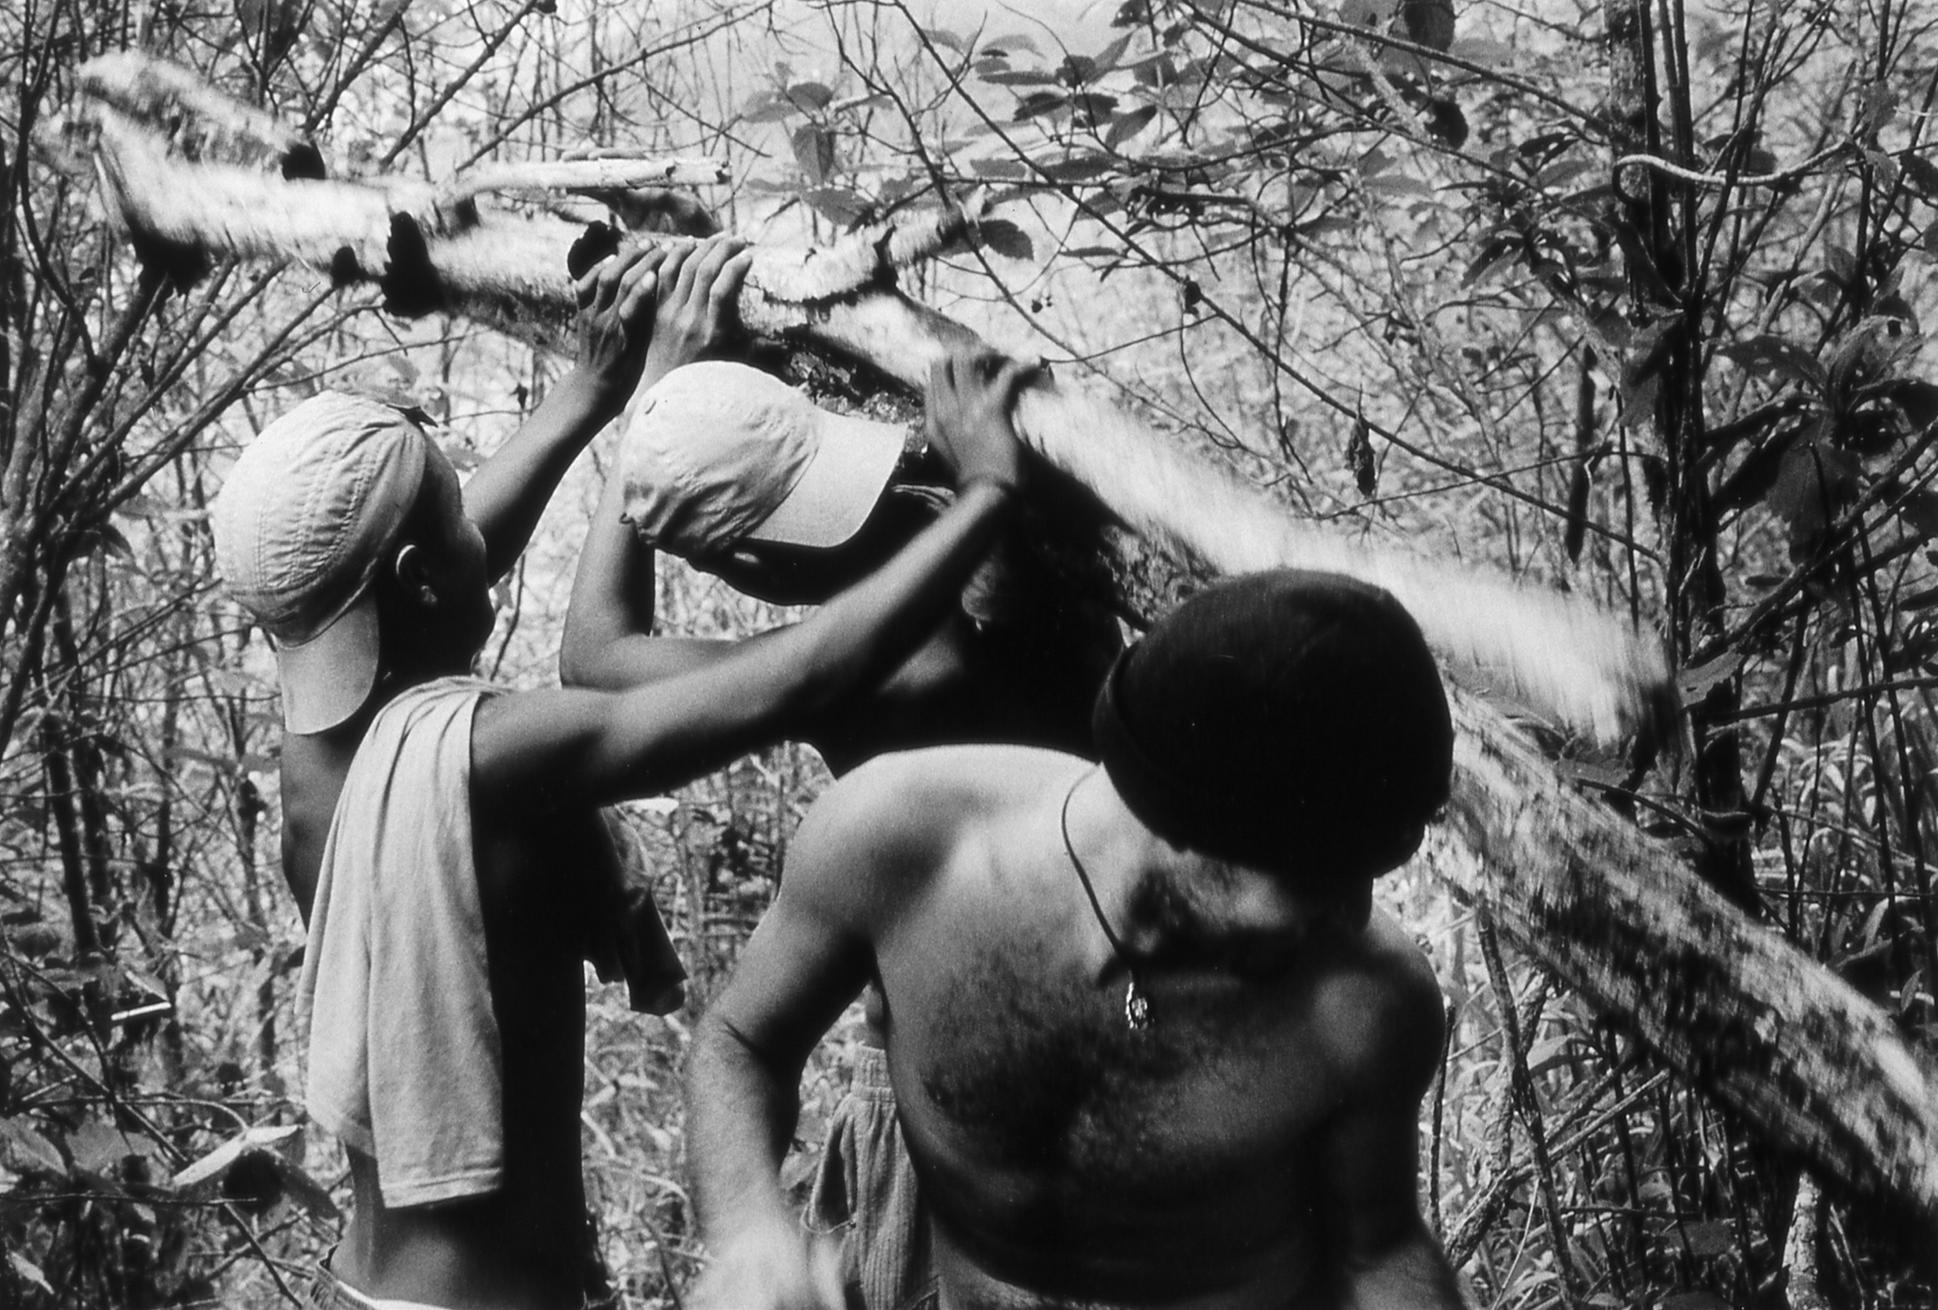 Gathering wood. Espirito Santo, Brazil.